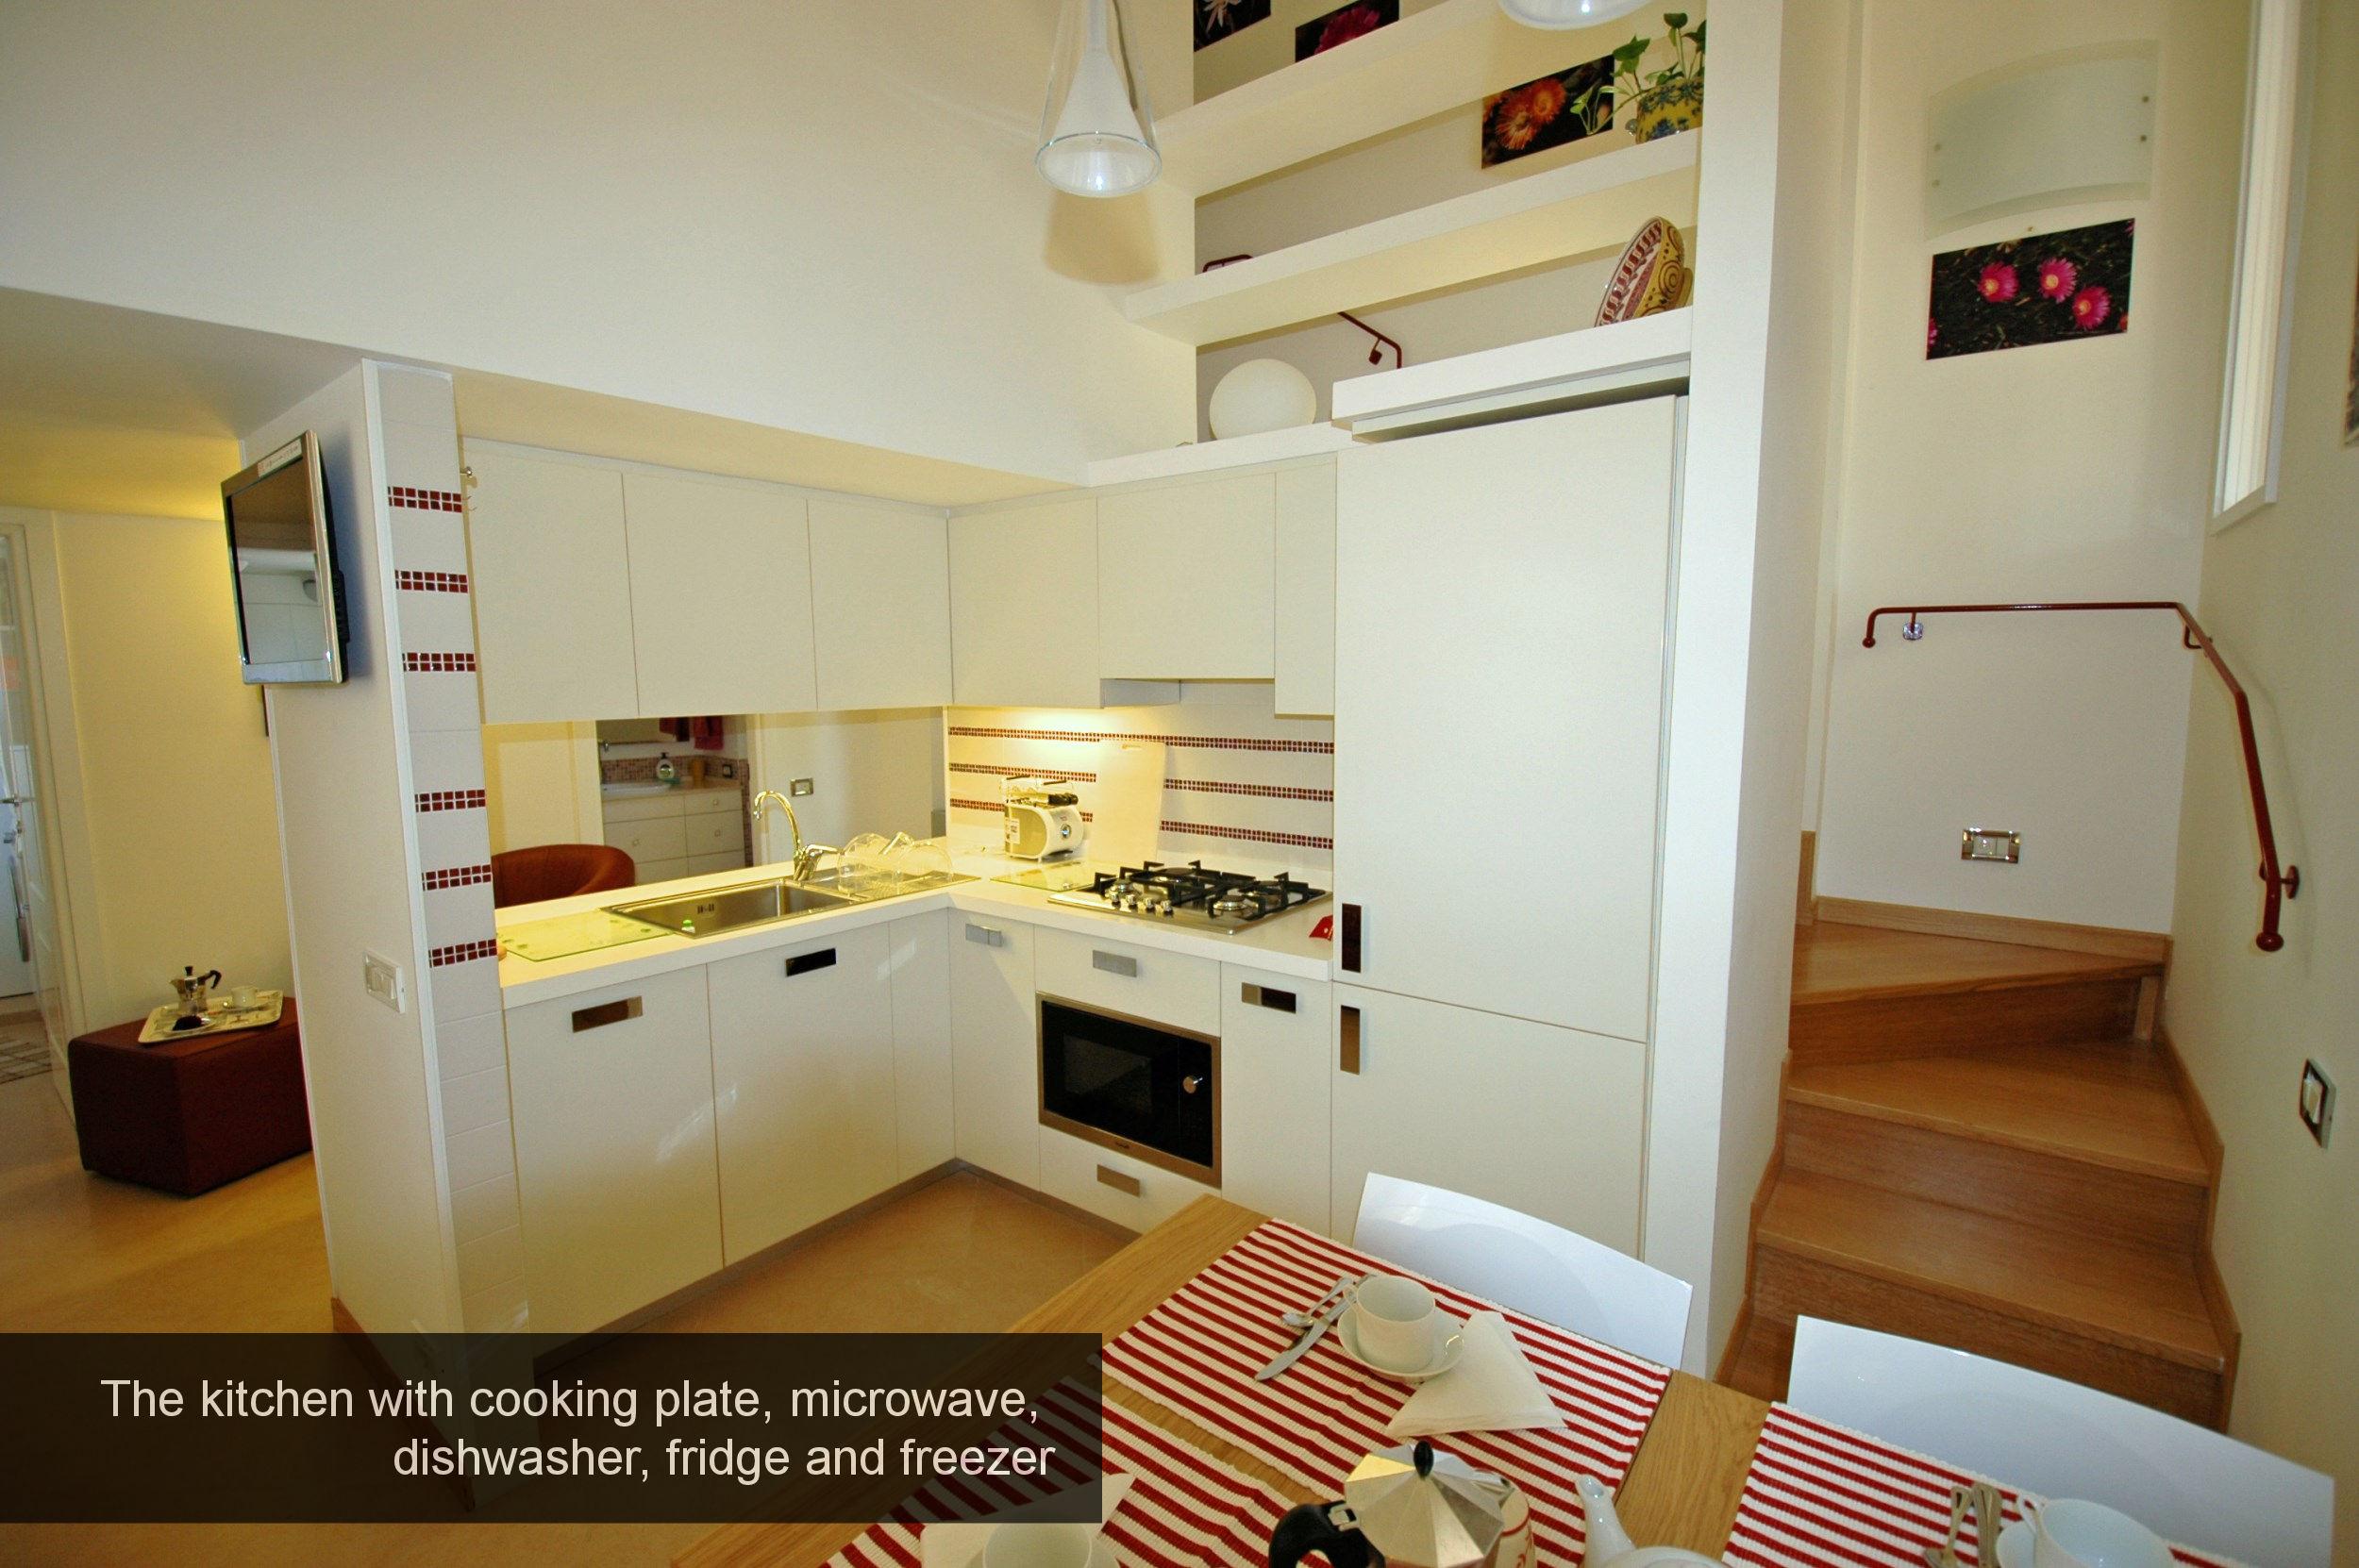 9) kitchen, cooking plate, microwave, dishwasher, fridge and freezer